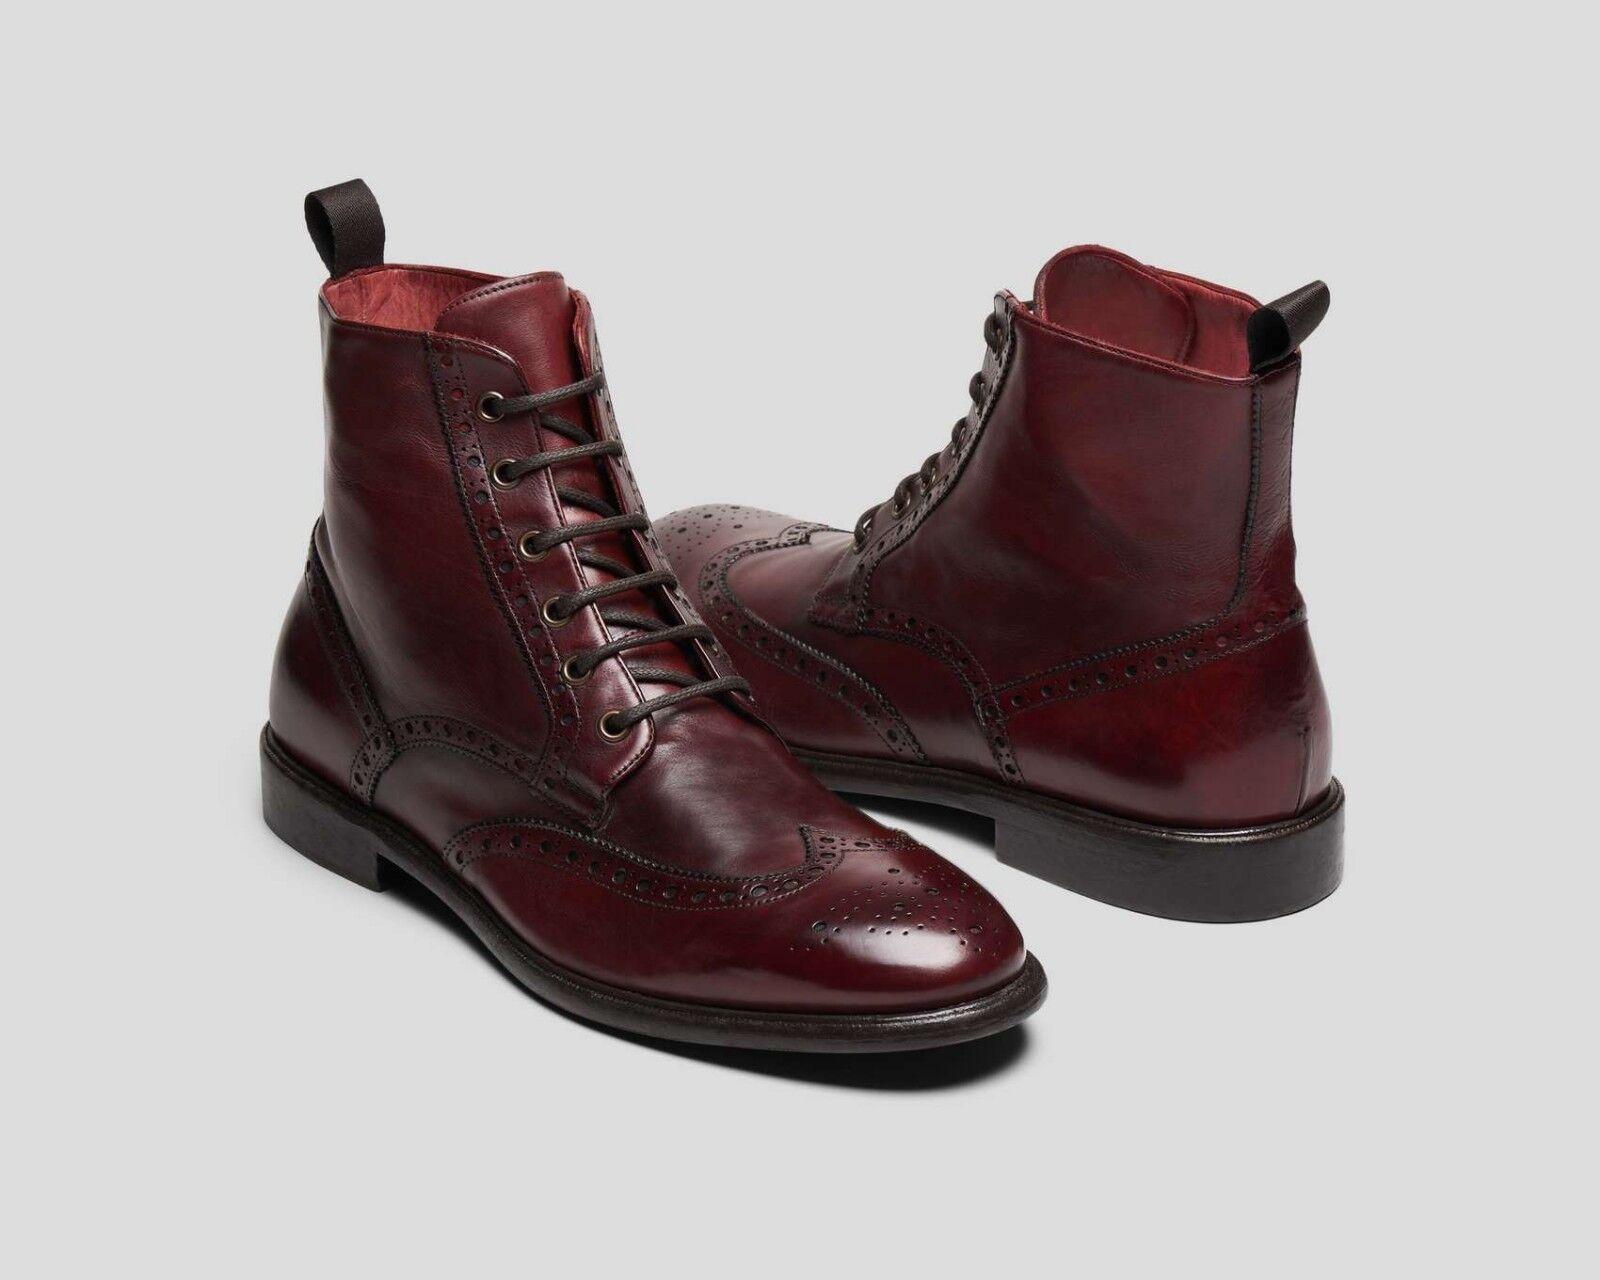 Handmade Men Burgogne Lace Up stivali, Men Ankle Leather stivali,  Men stivali  consegna diretta e rapida in fabbrica